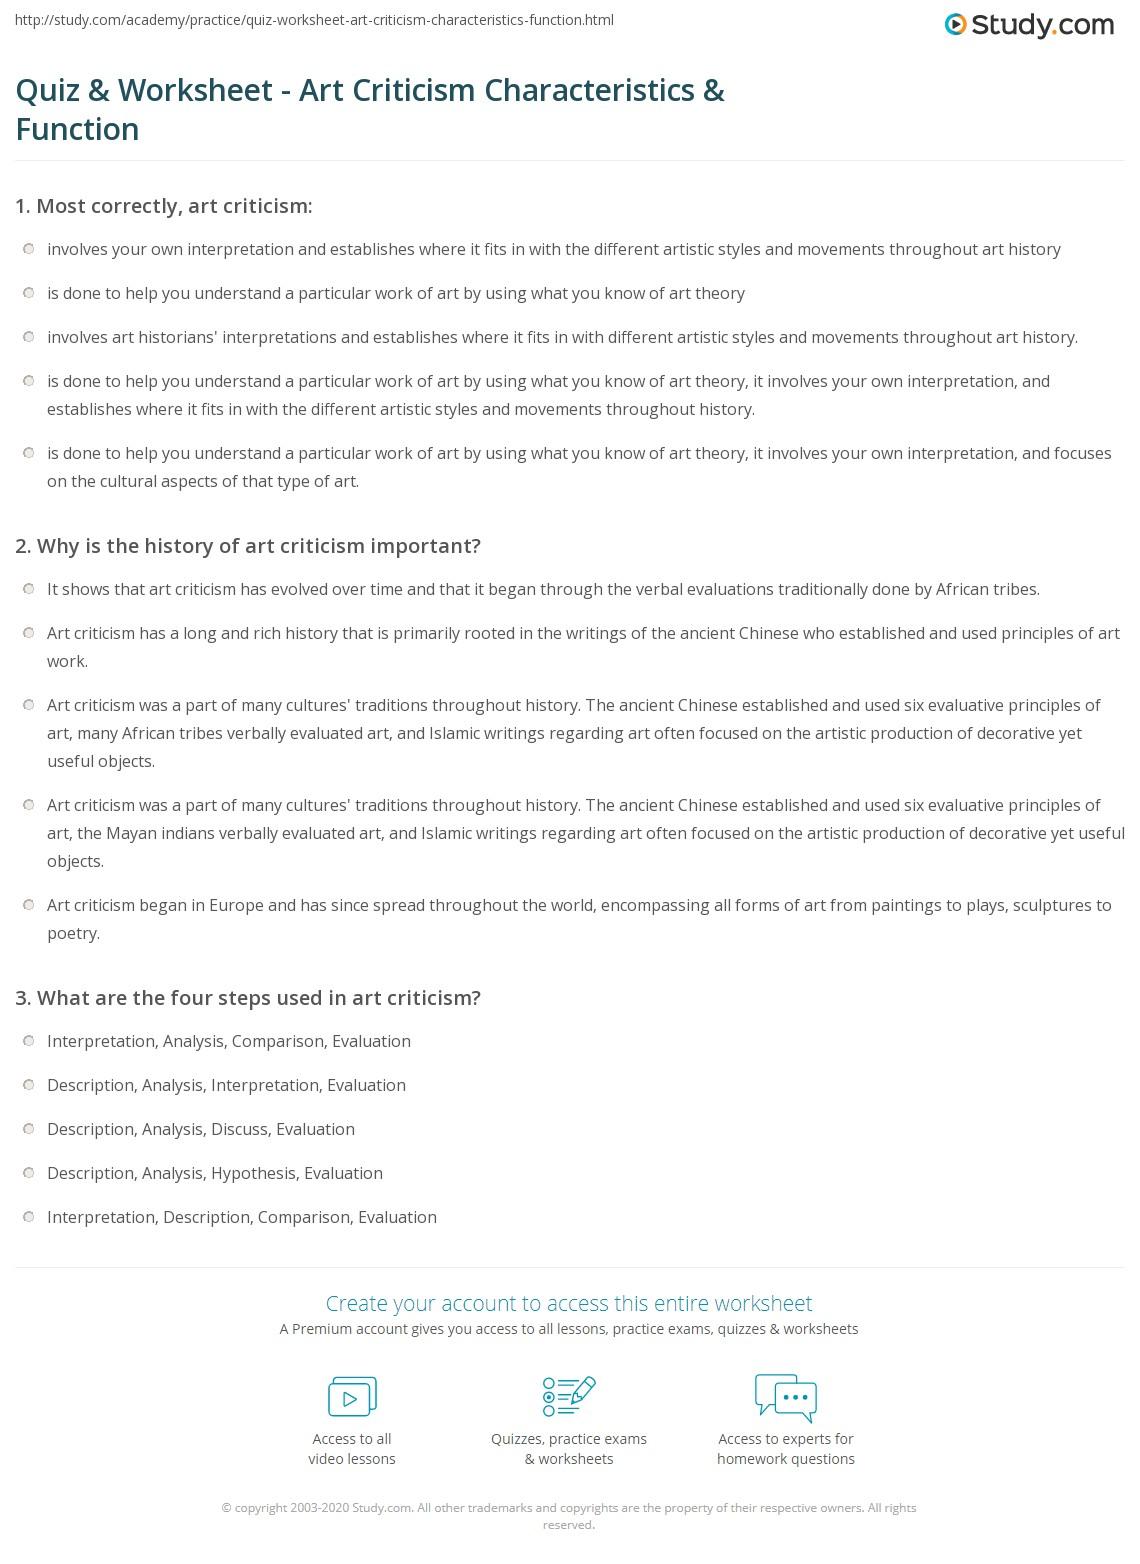 Criticalysis Worksheet Free Printable Textysis